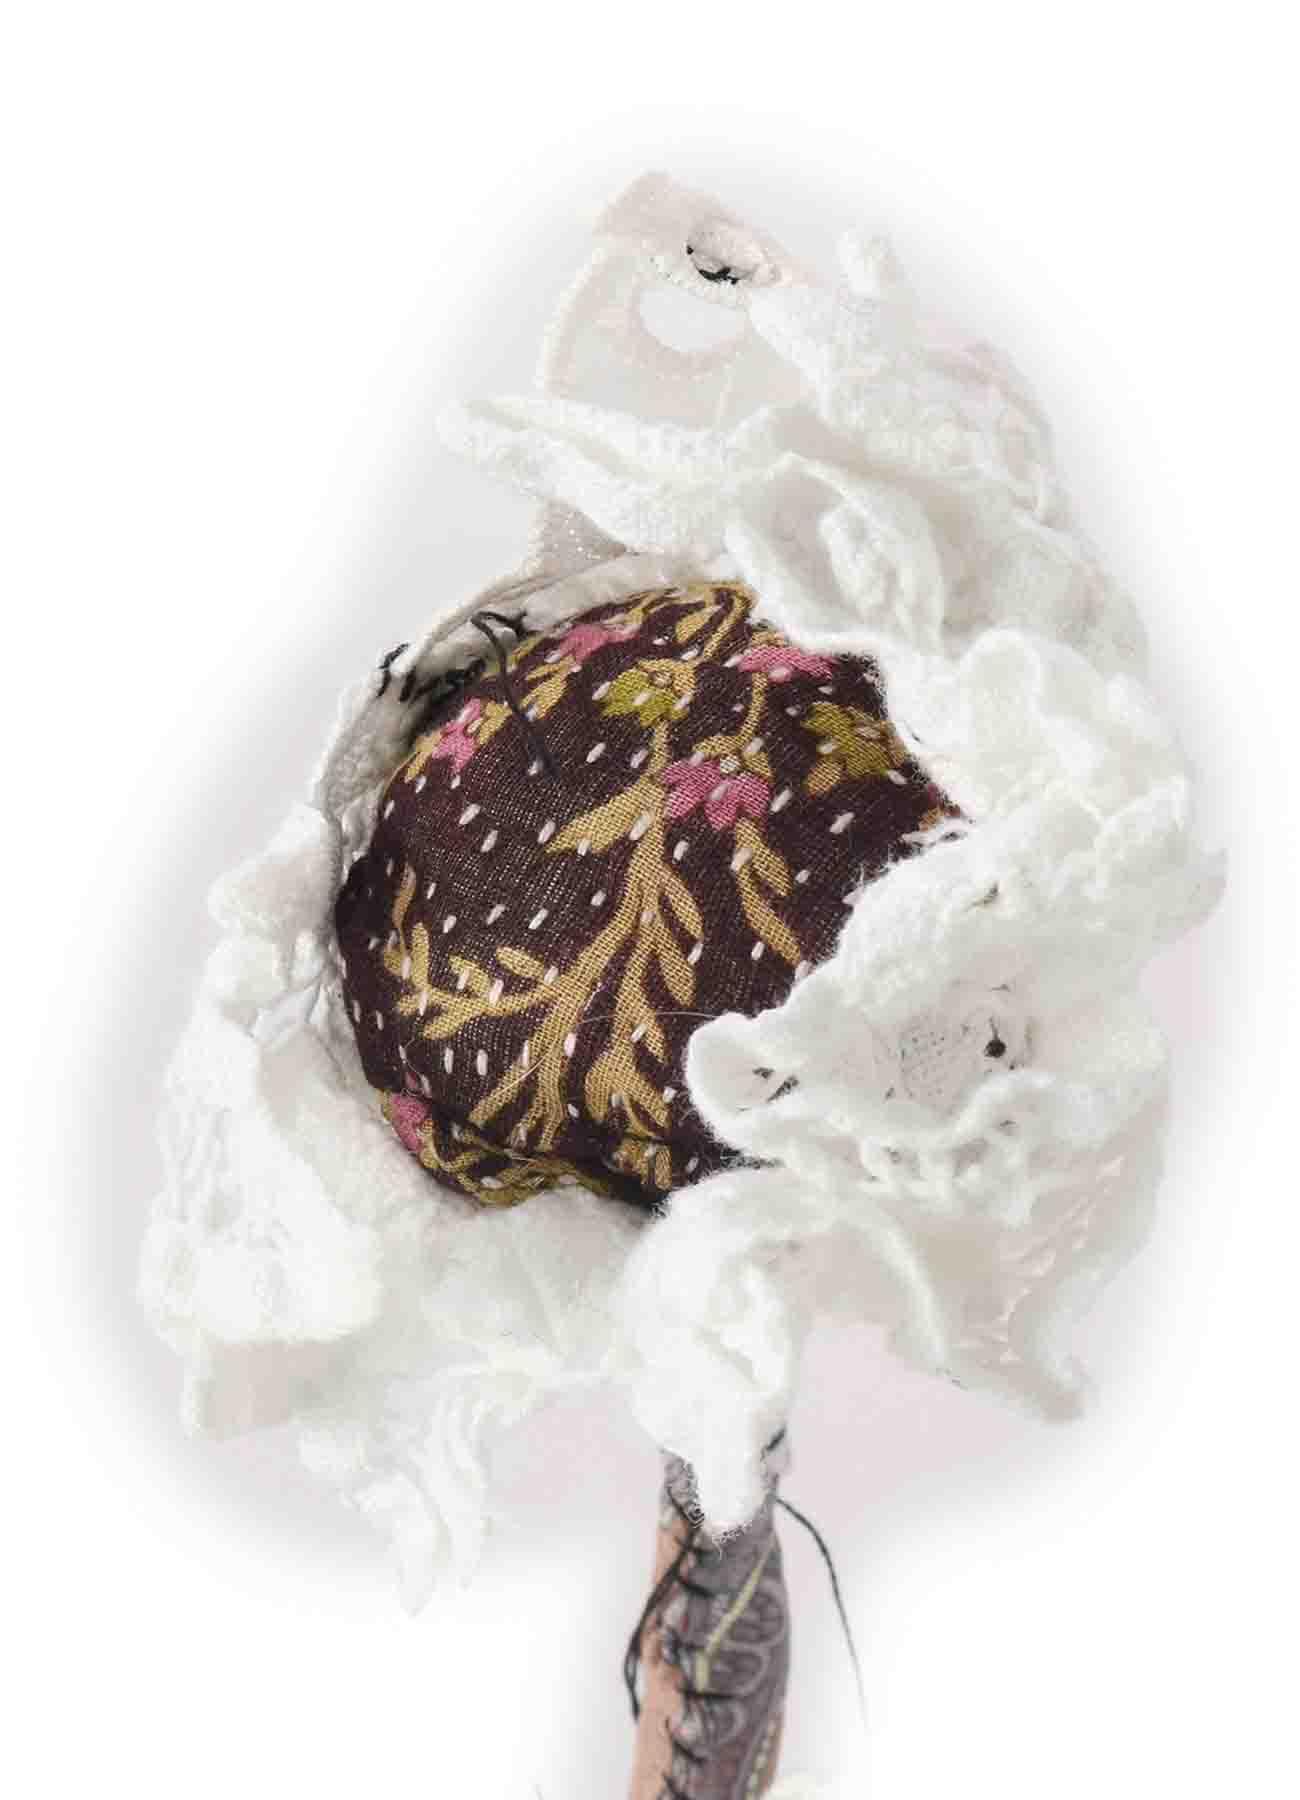 Fleur フラワー PIECE UNIQUE KAYO NAKAMURA by Y's×Anne-Valerie Dupond